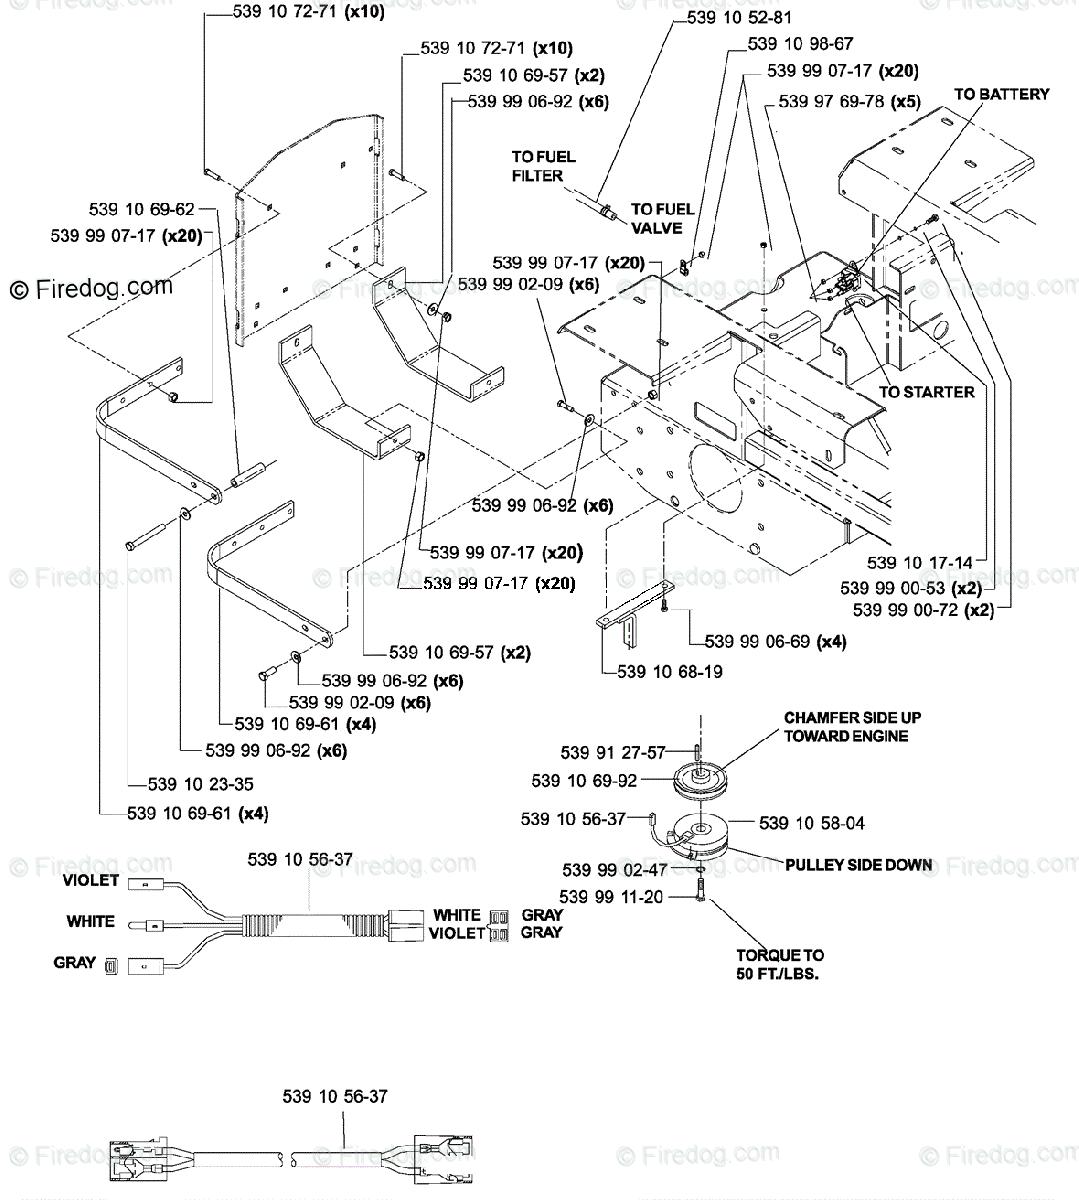 kawasaki x2 engine diagram wiring diagram schemakawasaki x2 engine diagram library wiring diagram kawasaki 650sx engine kawasaki x2 engine diagram